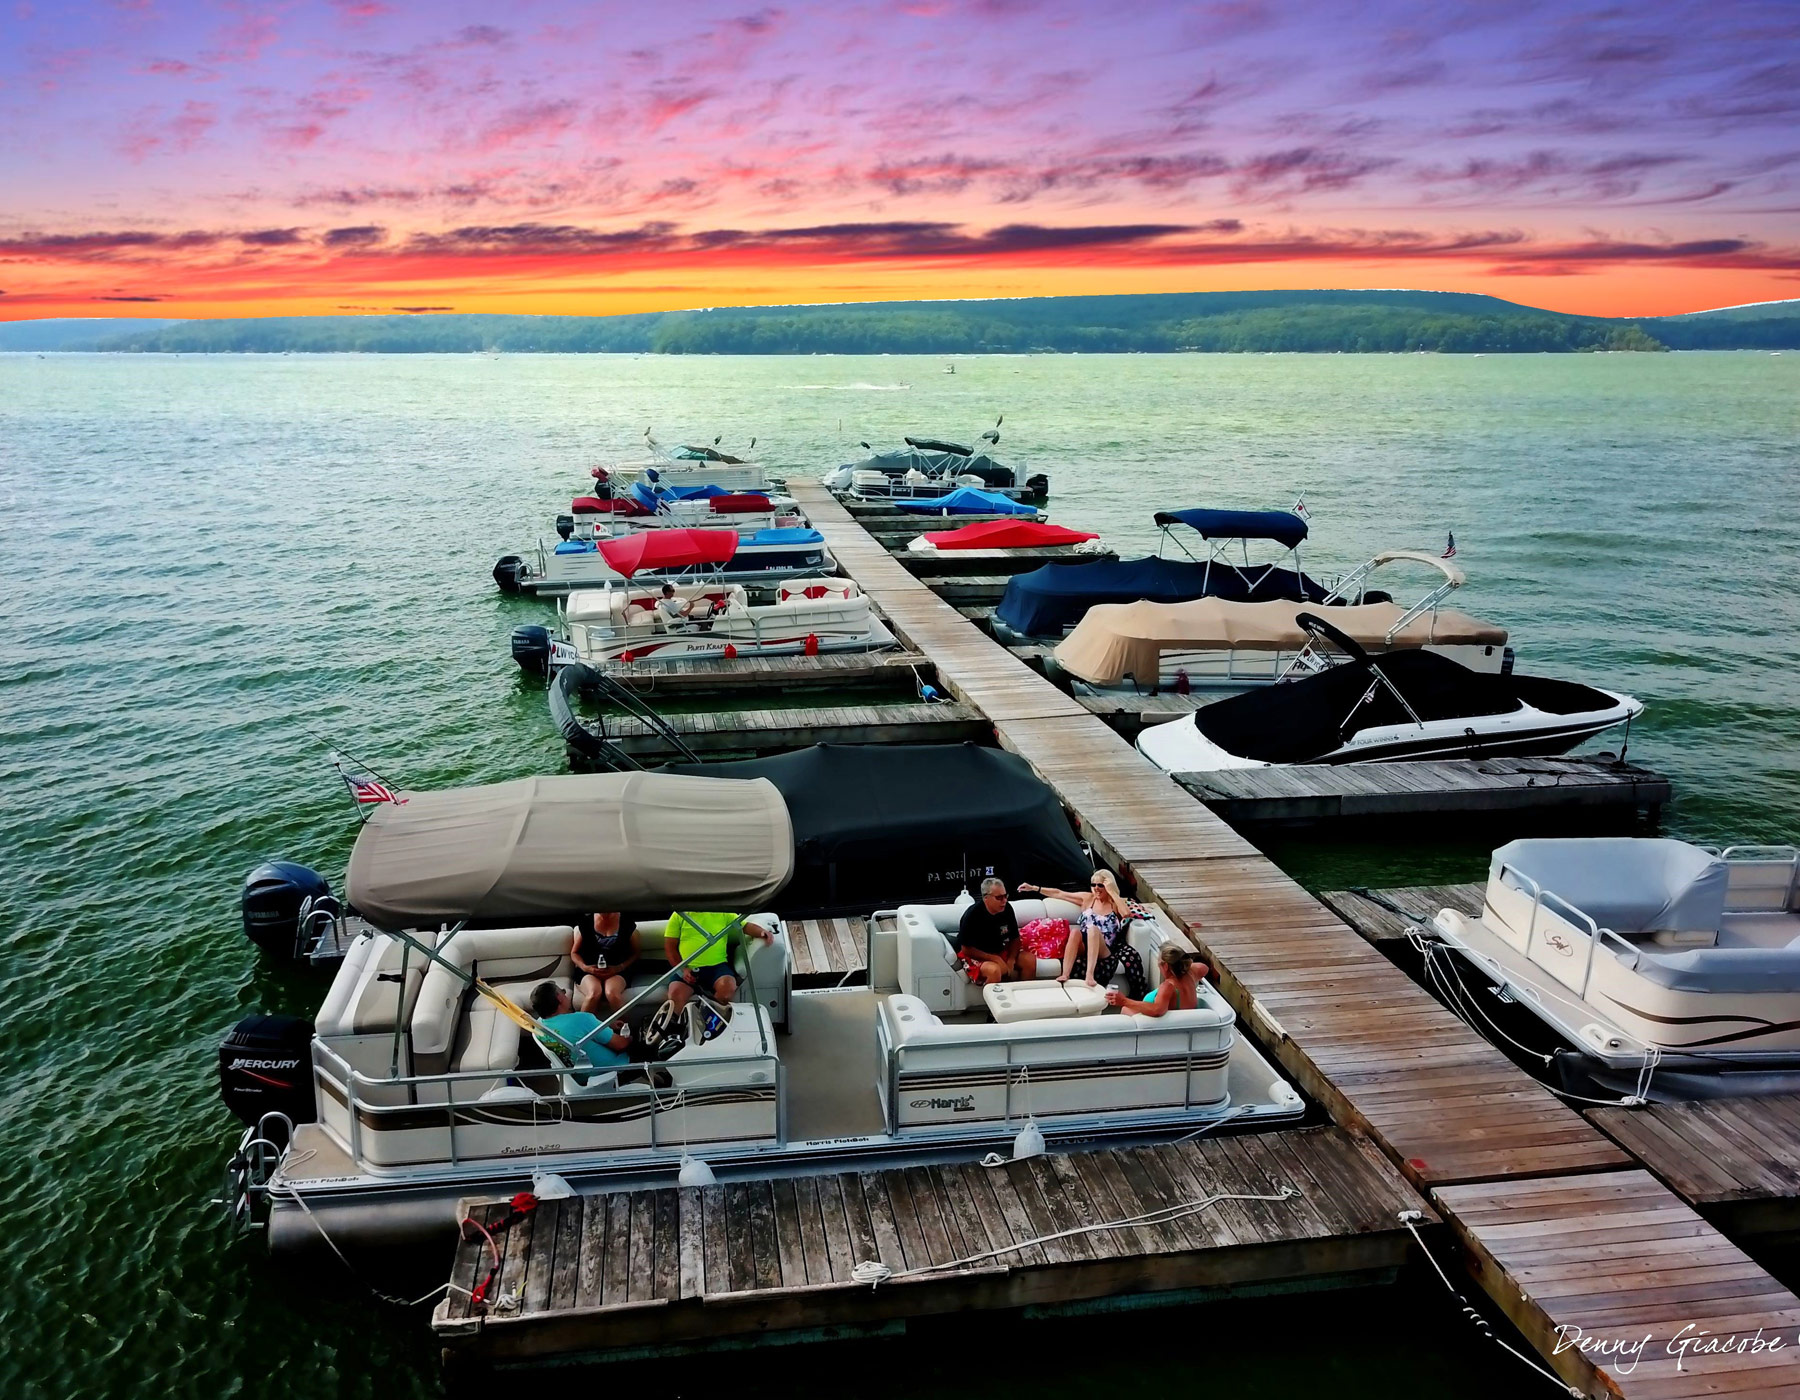 LWYC docks